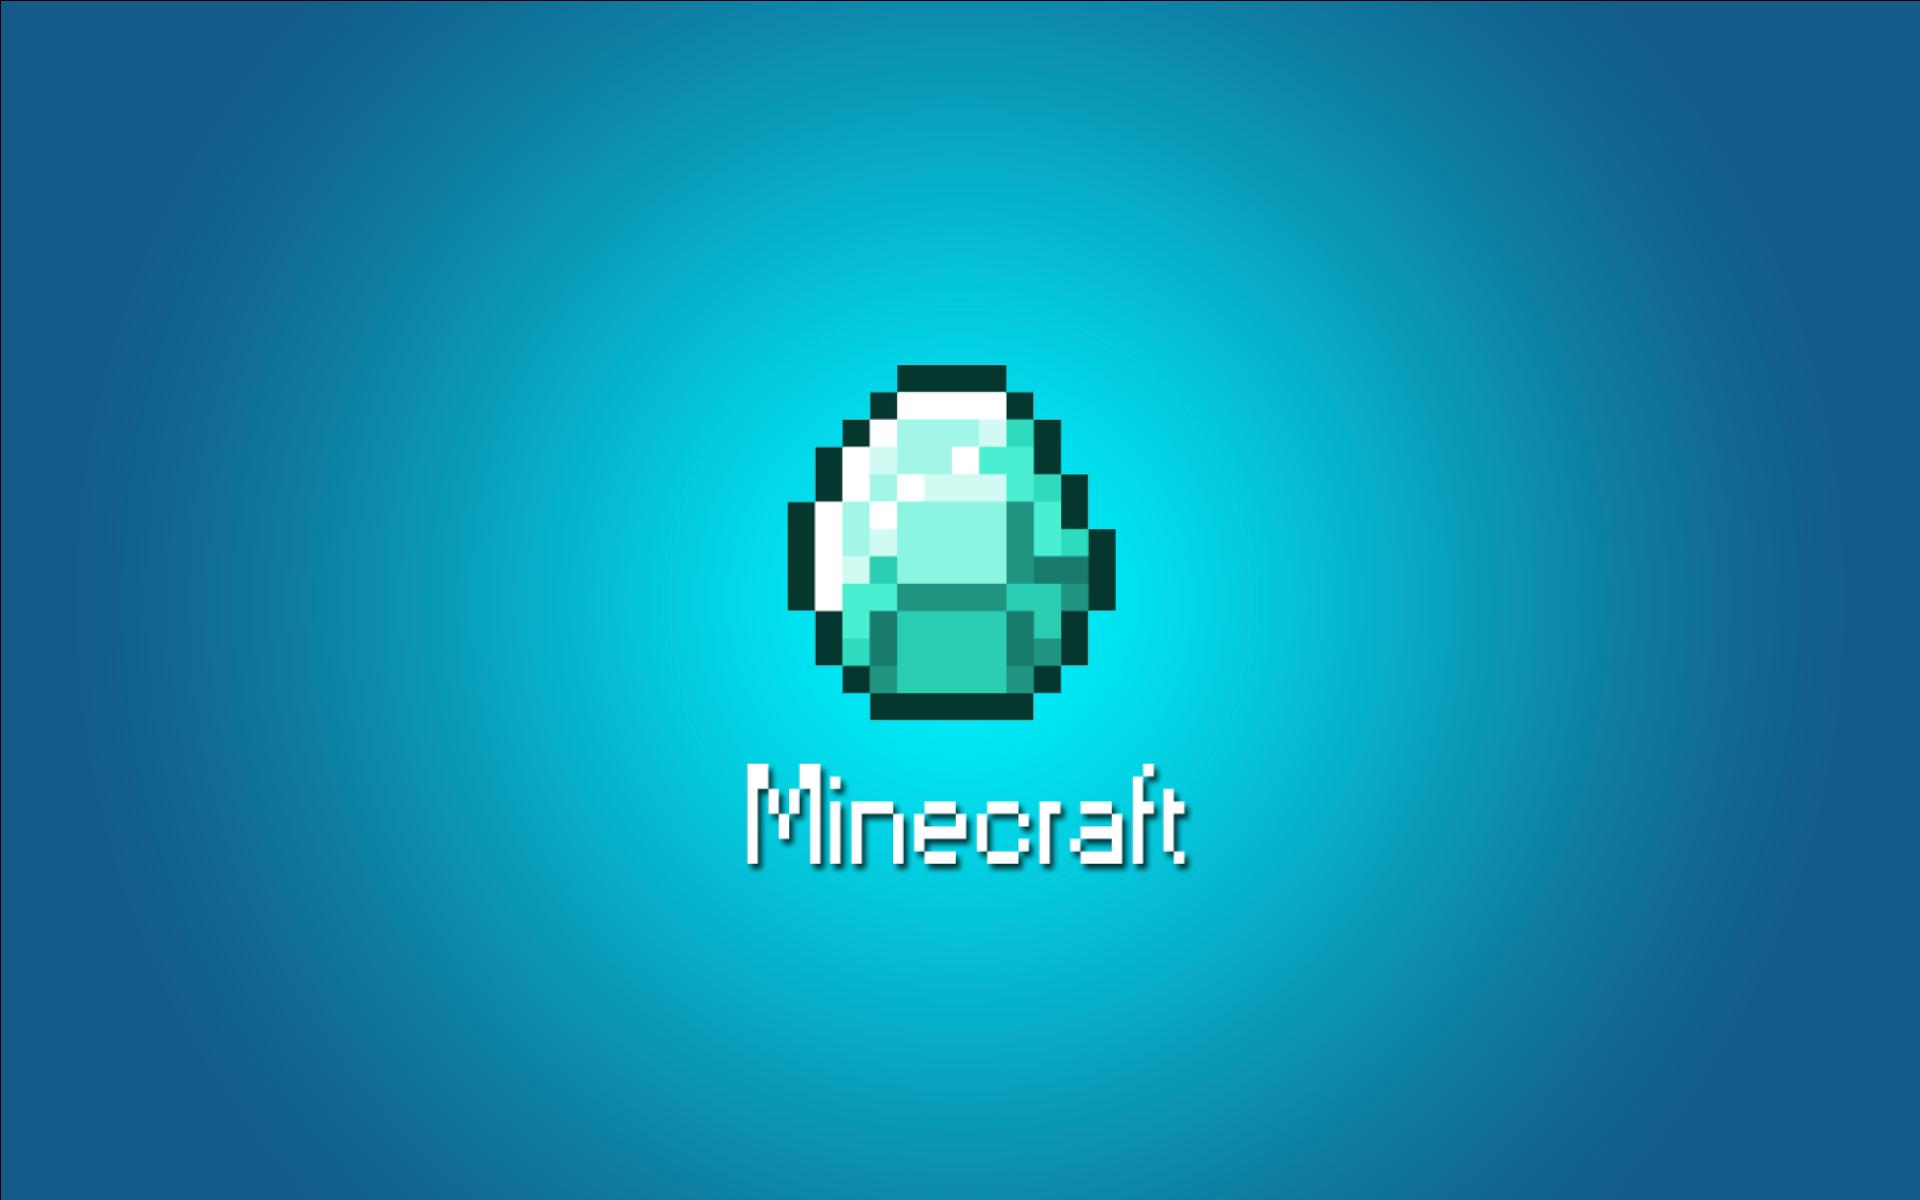 Minecraft Diamond Rush Wallpaper 1920x1200